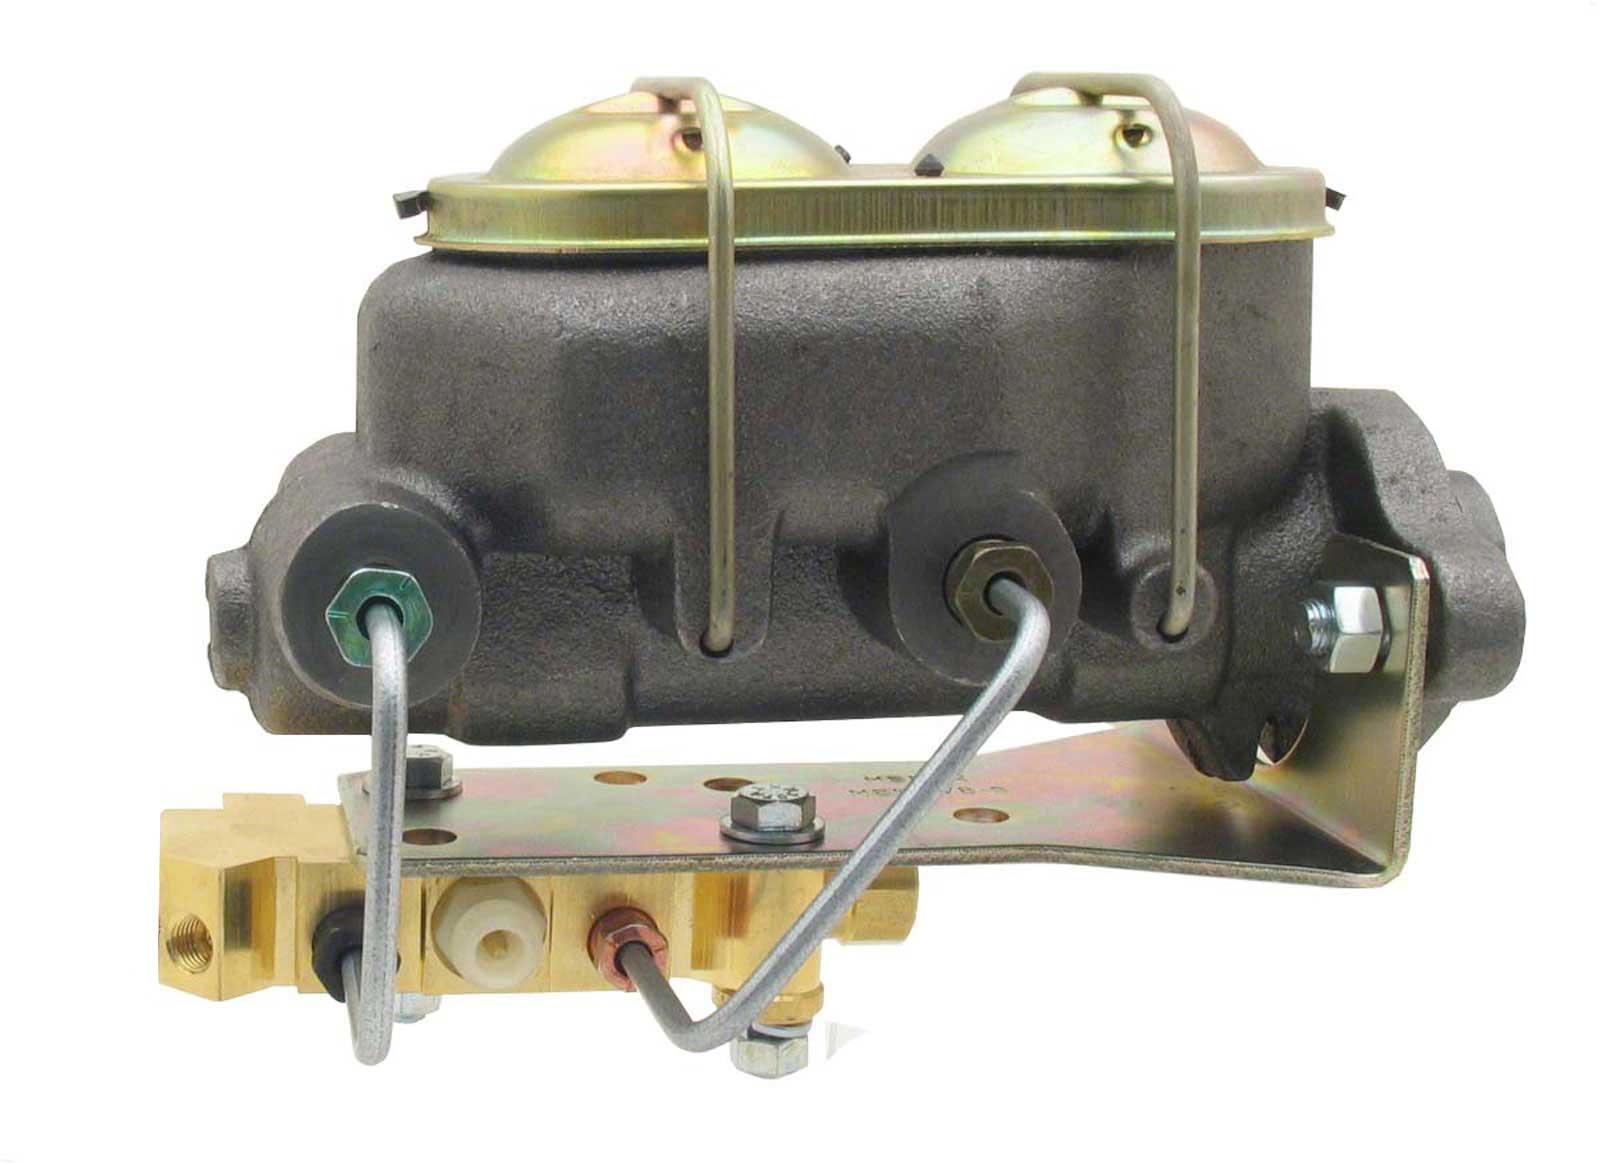 Universal Cast Iron Master Cylinder Kit W/ Bottom Mount Disc/Disc Proportioning Valve